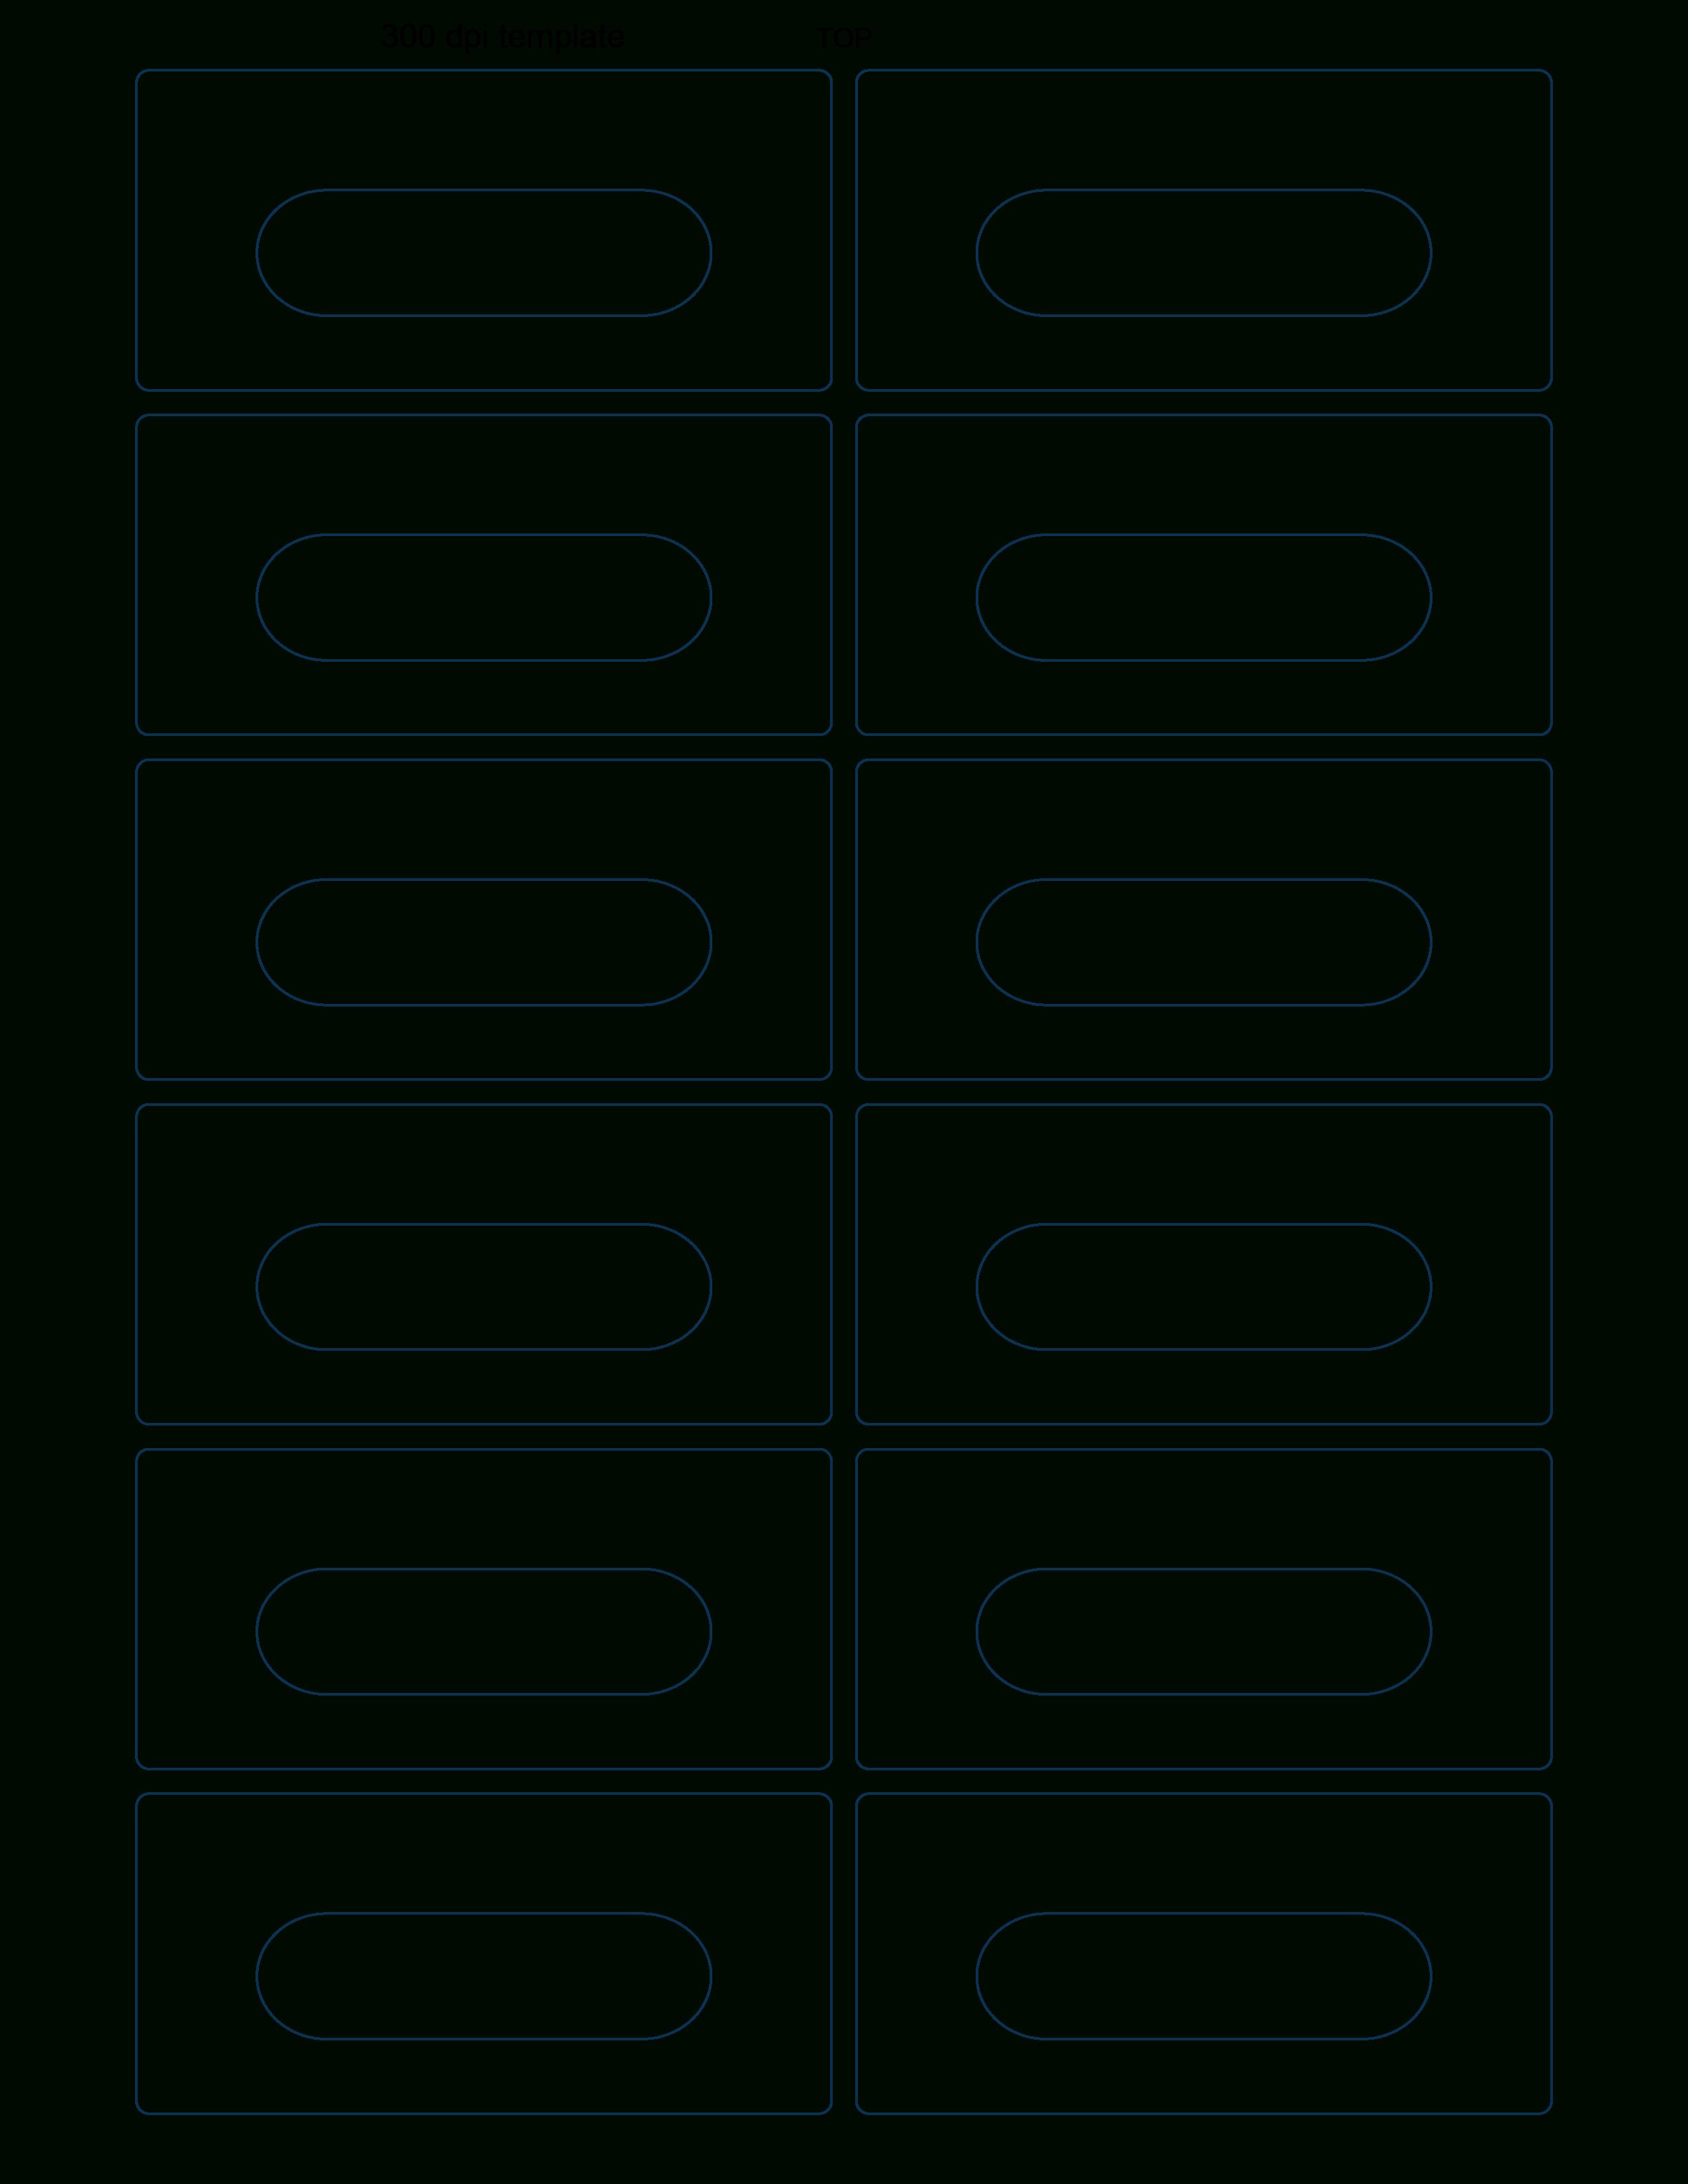 Audio Cassette Cover Template Downloads Regarding File Side Label Template